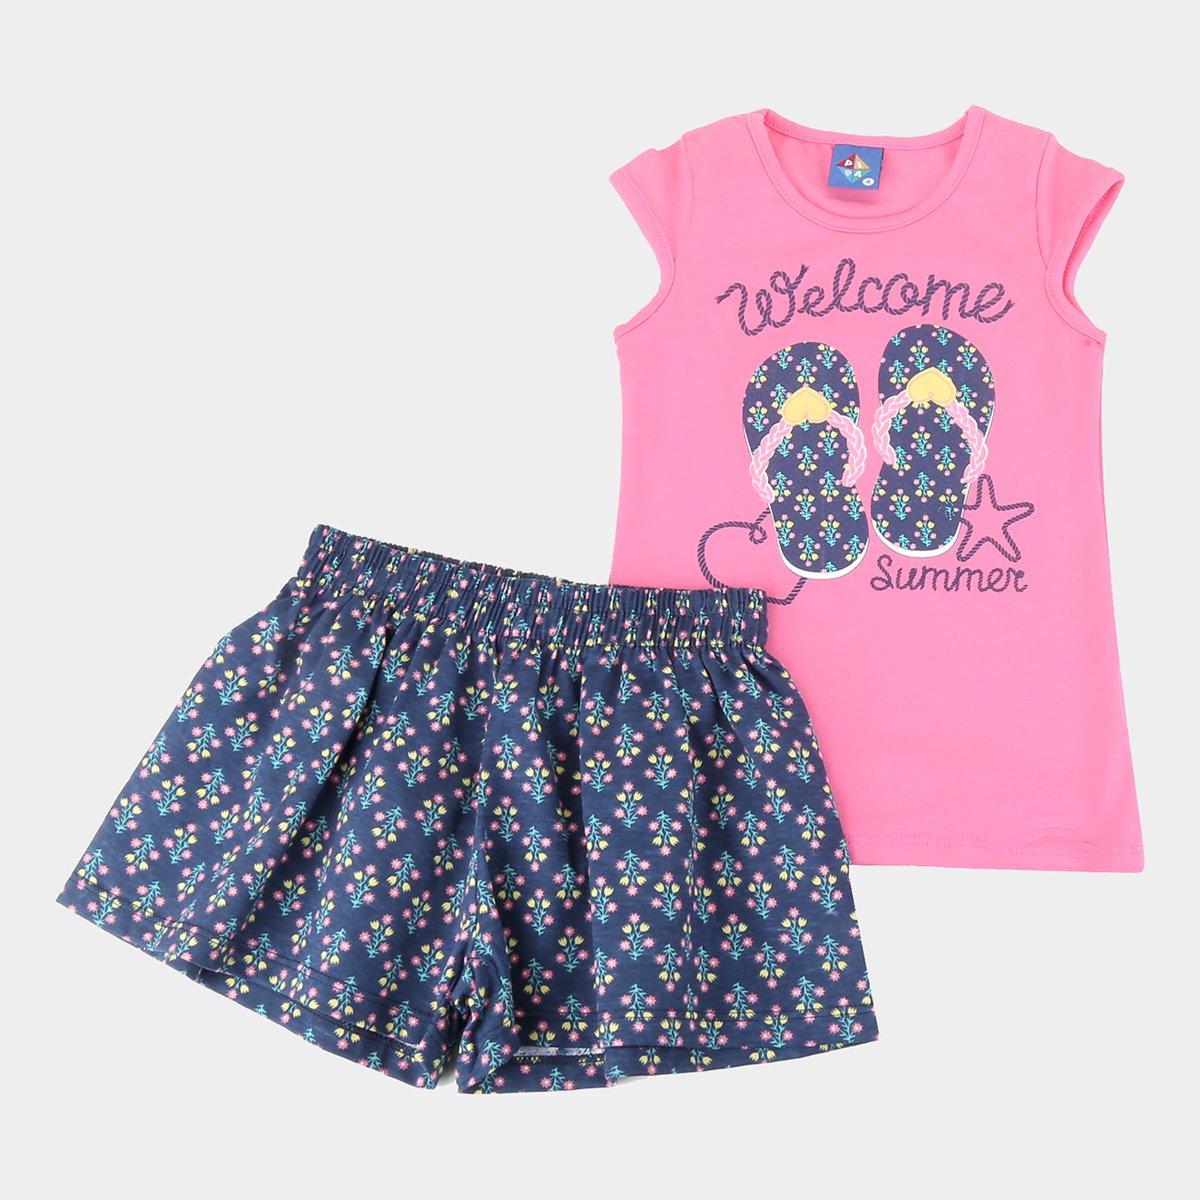 Conjunto infantil Pipa Regata E Shorts Welcome Summer Feminino